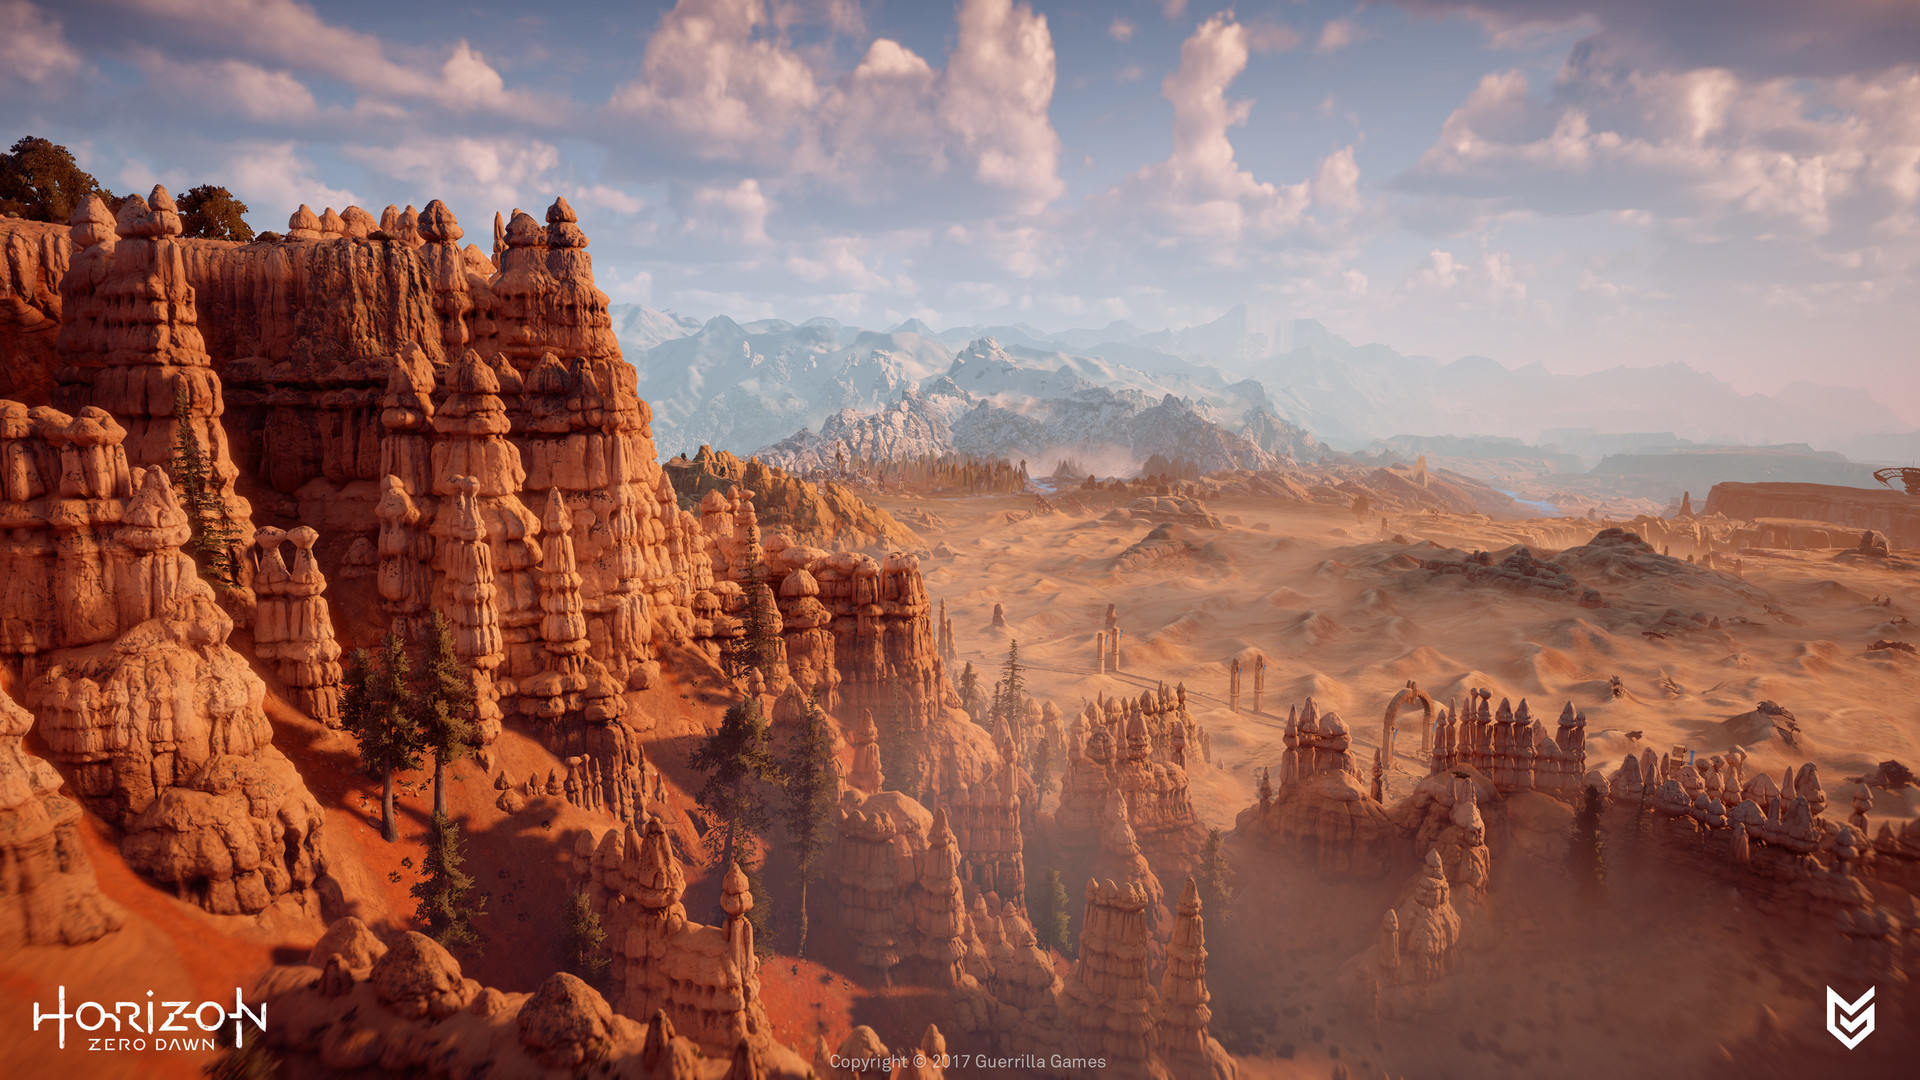 Lukas kolz shadow carja territory based on bryce canyon utah